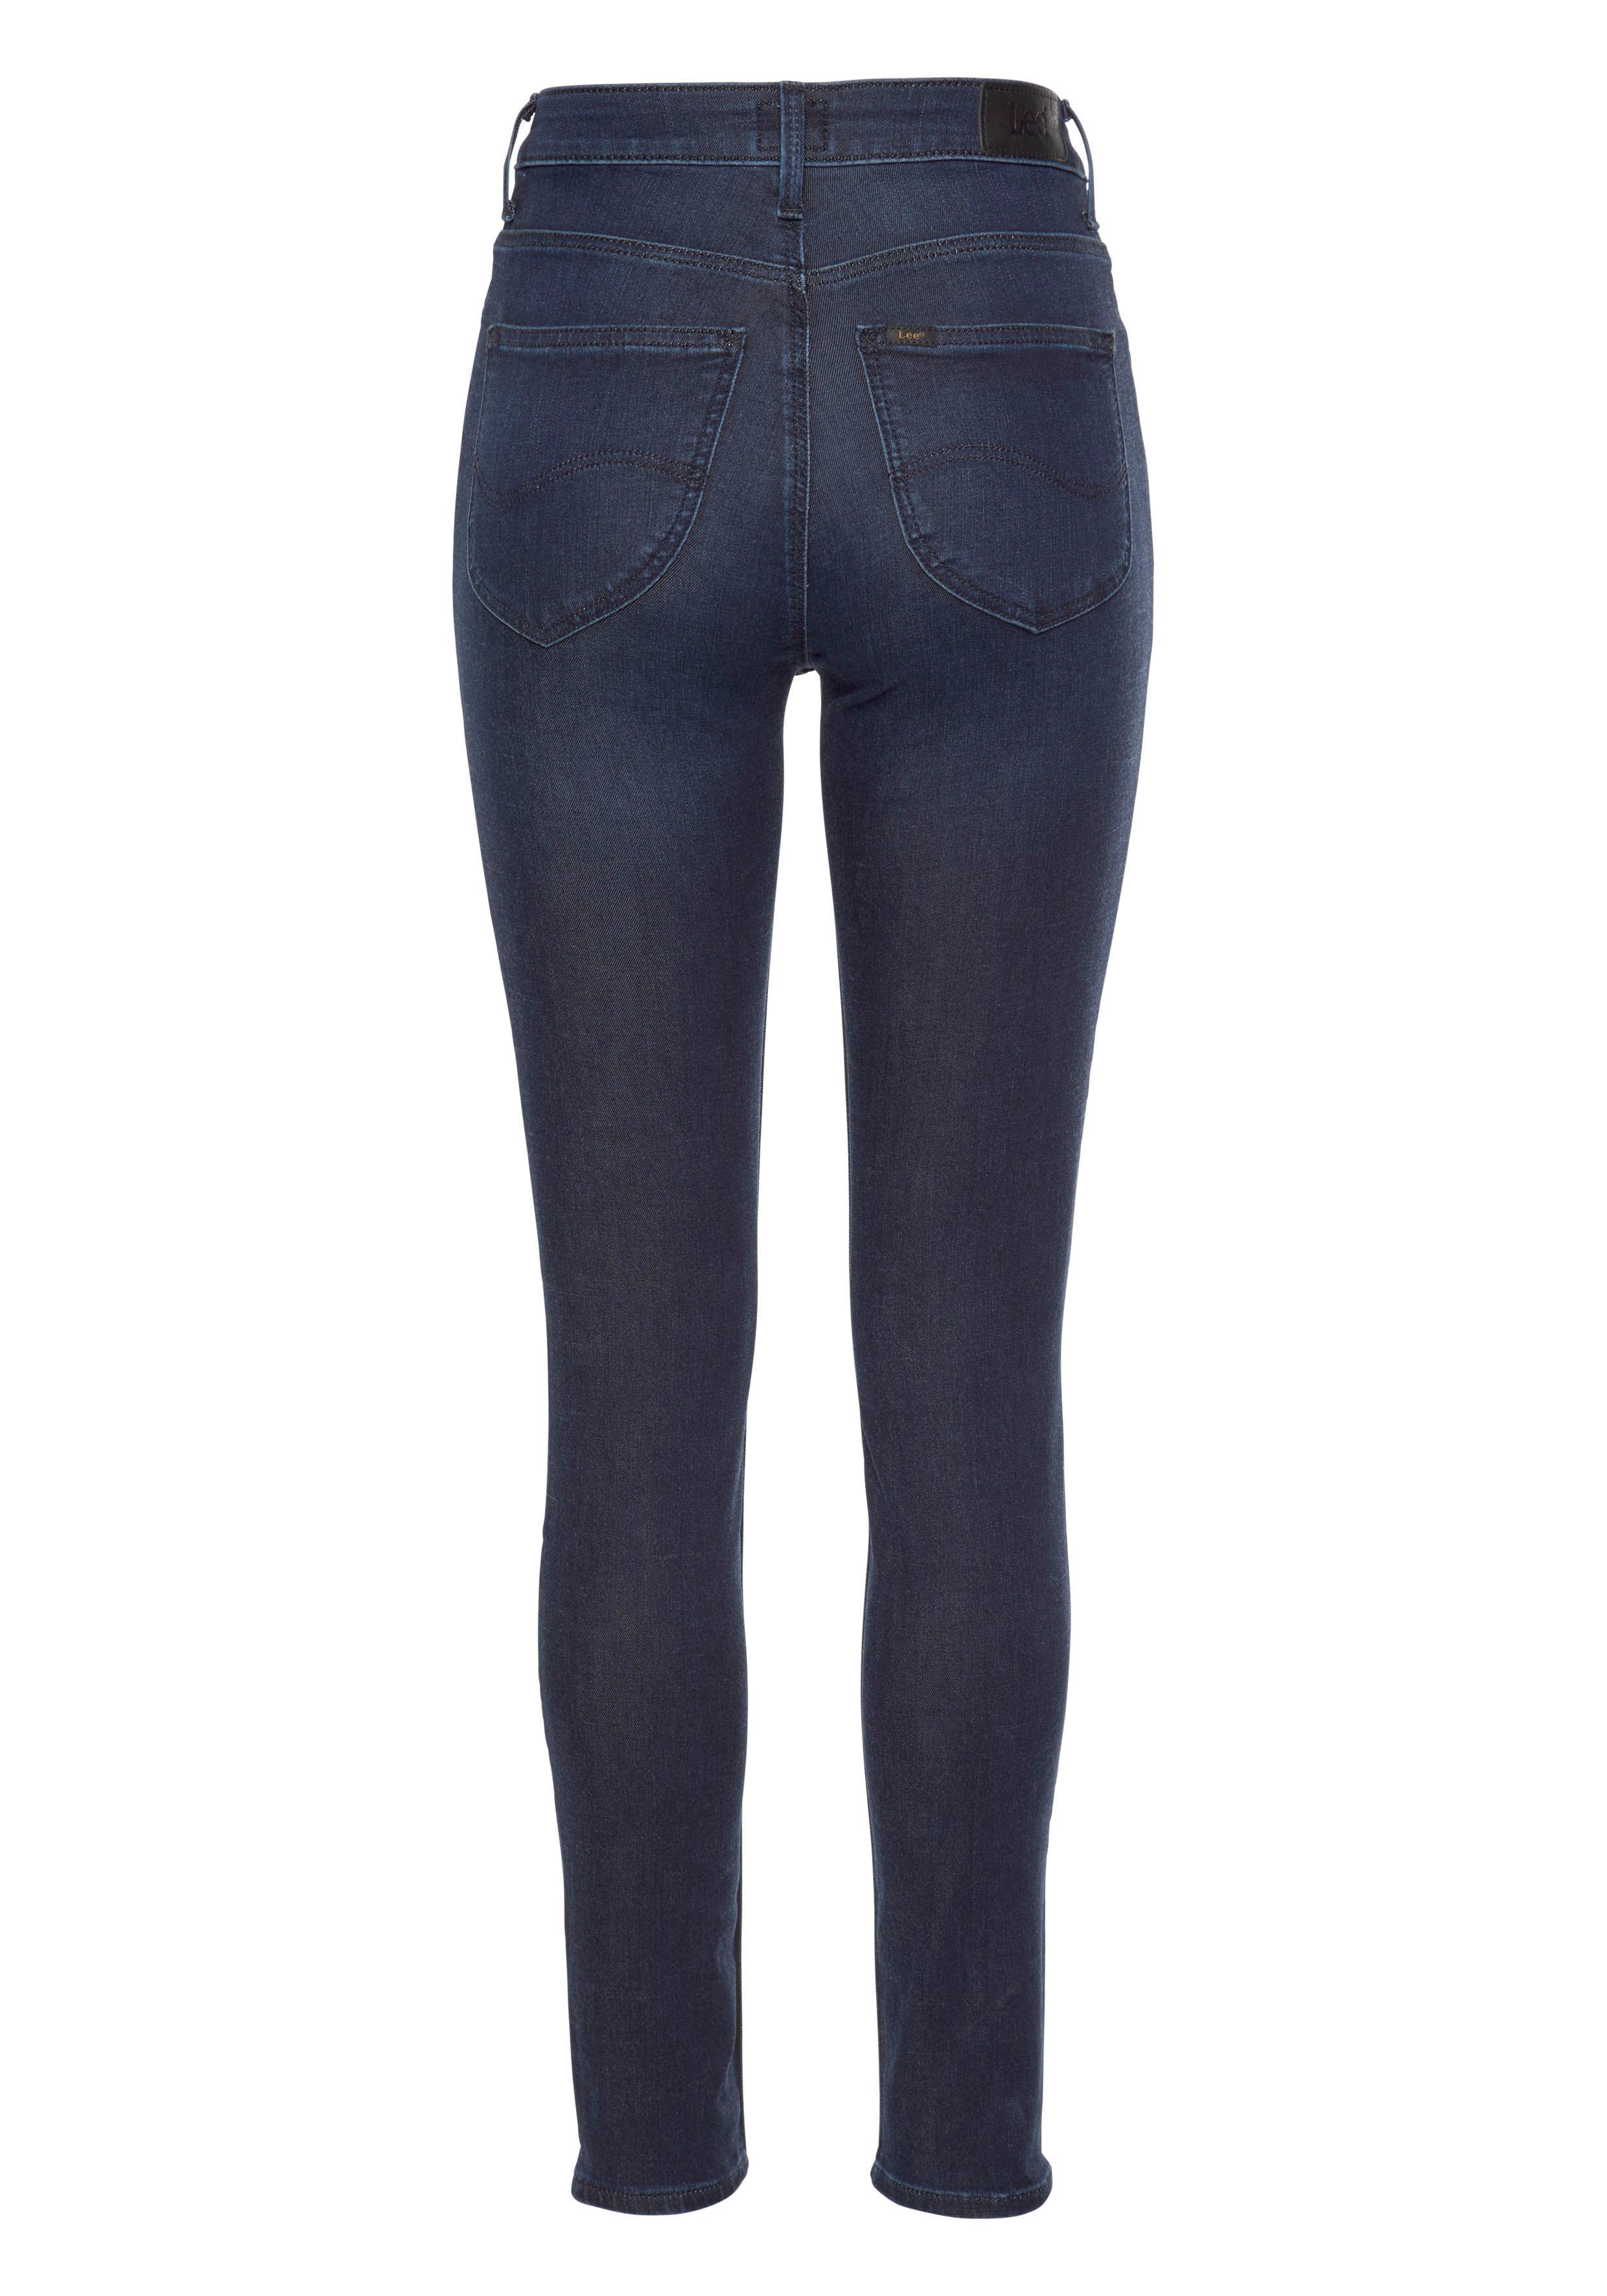 Lee High-waist-Jeans Scarlett | Bekleidung > Jeans > High Waist Jeans | Blau | Lee